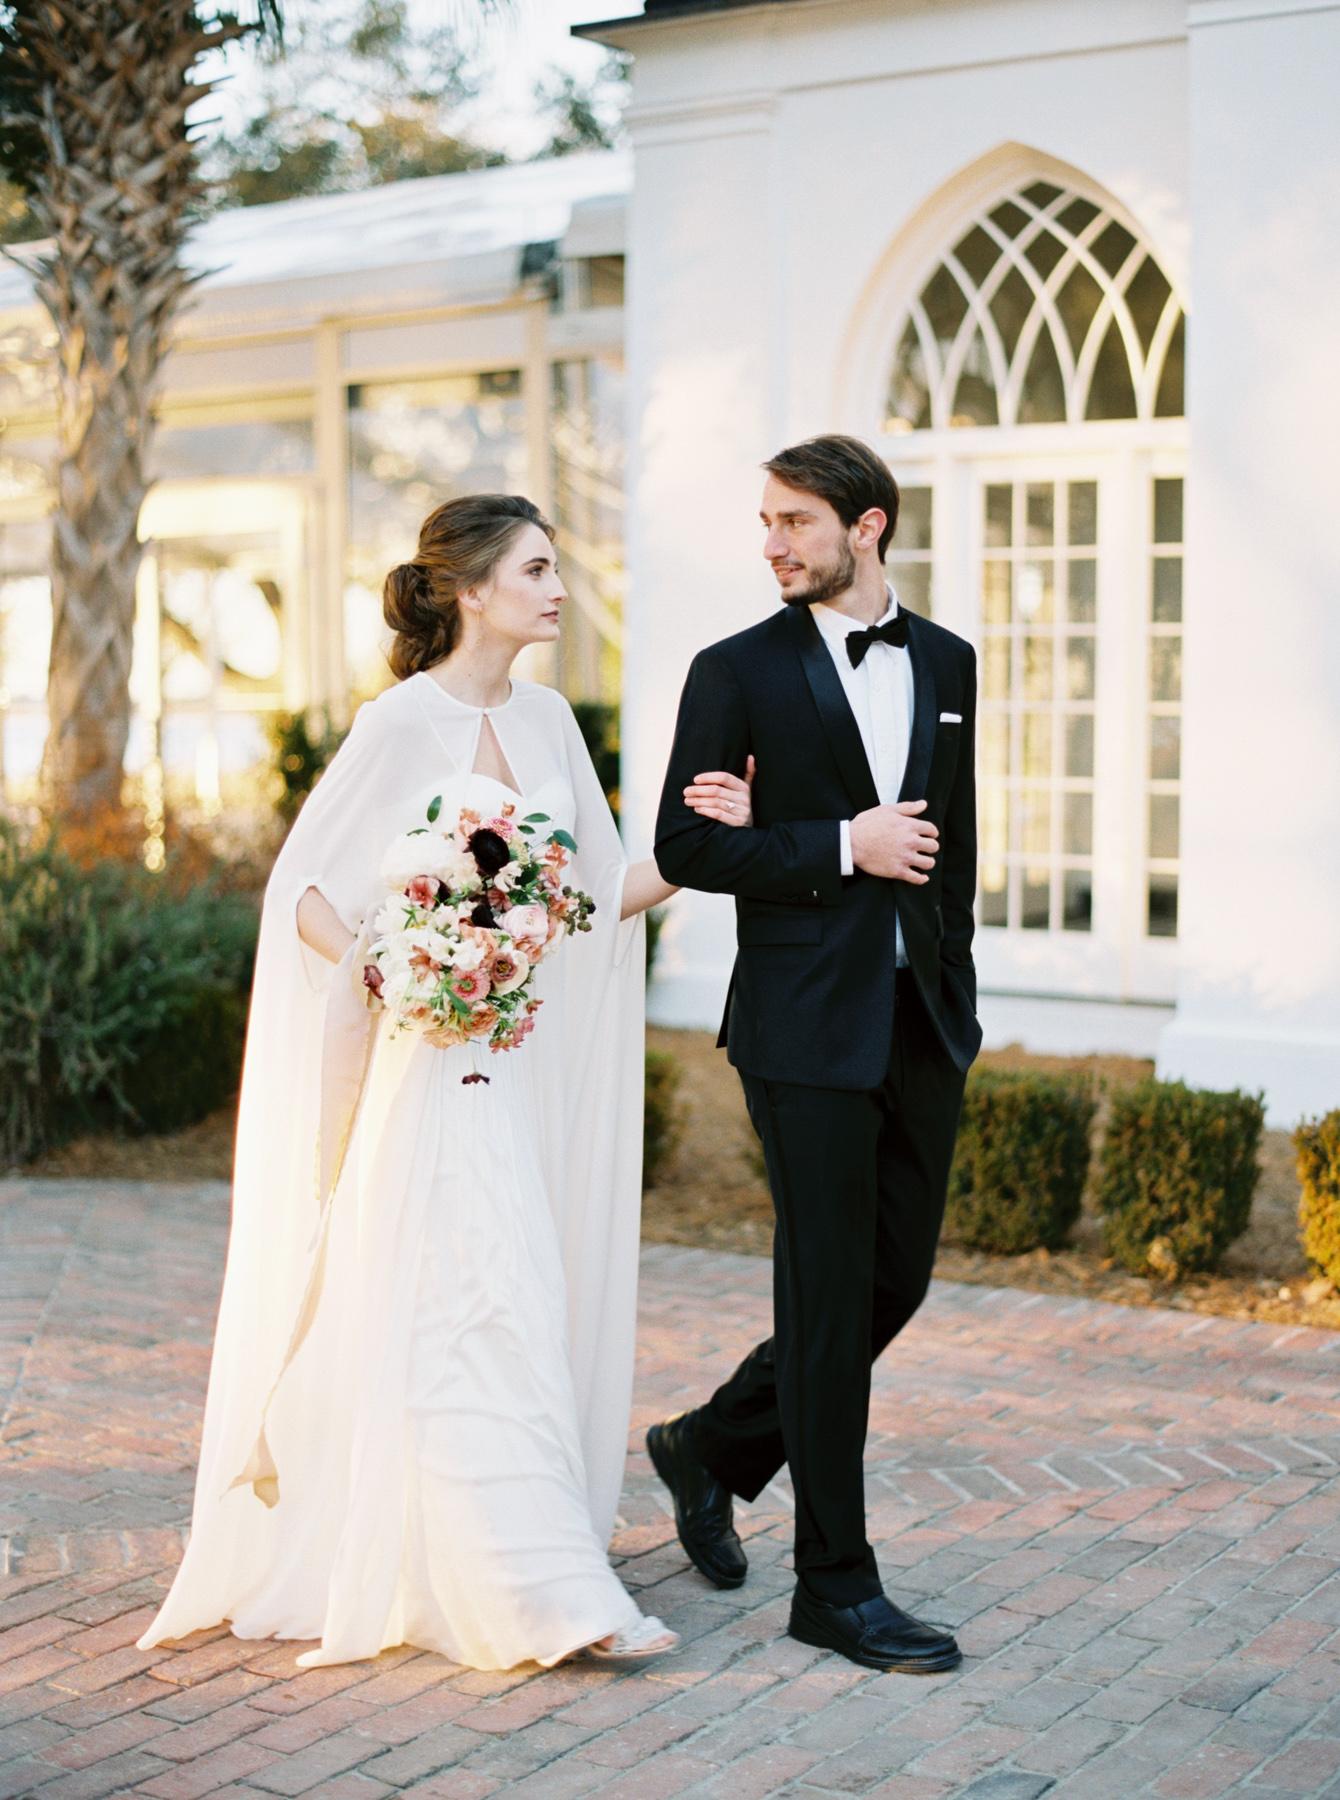 Carlos-Hernandez-Photography-Charleston-South-Carolina-SC-Lowndes-Grove-Plantation-Wedding-Photographer-Workshop-Oncewed-039